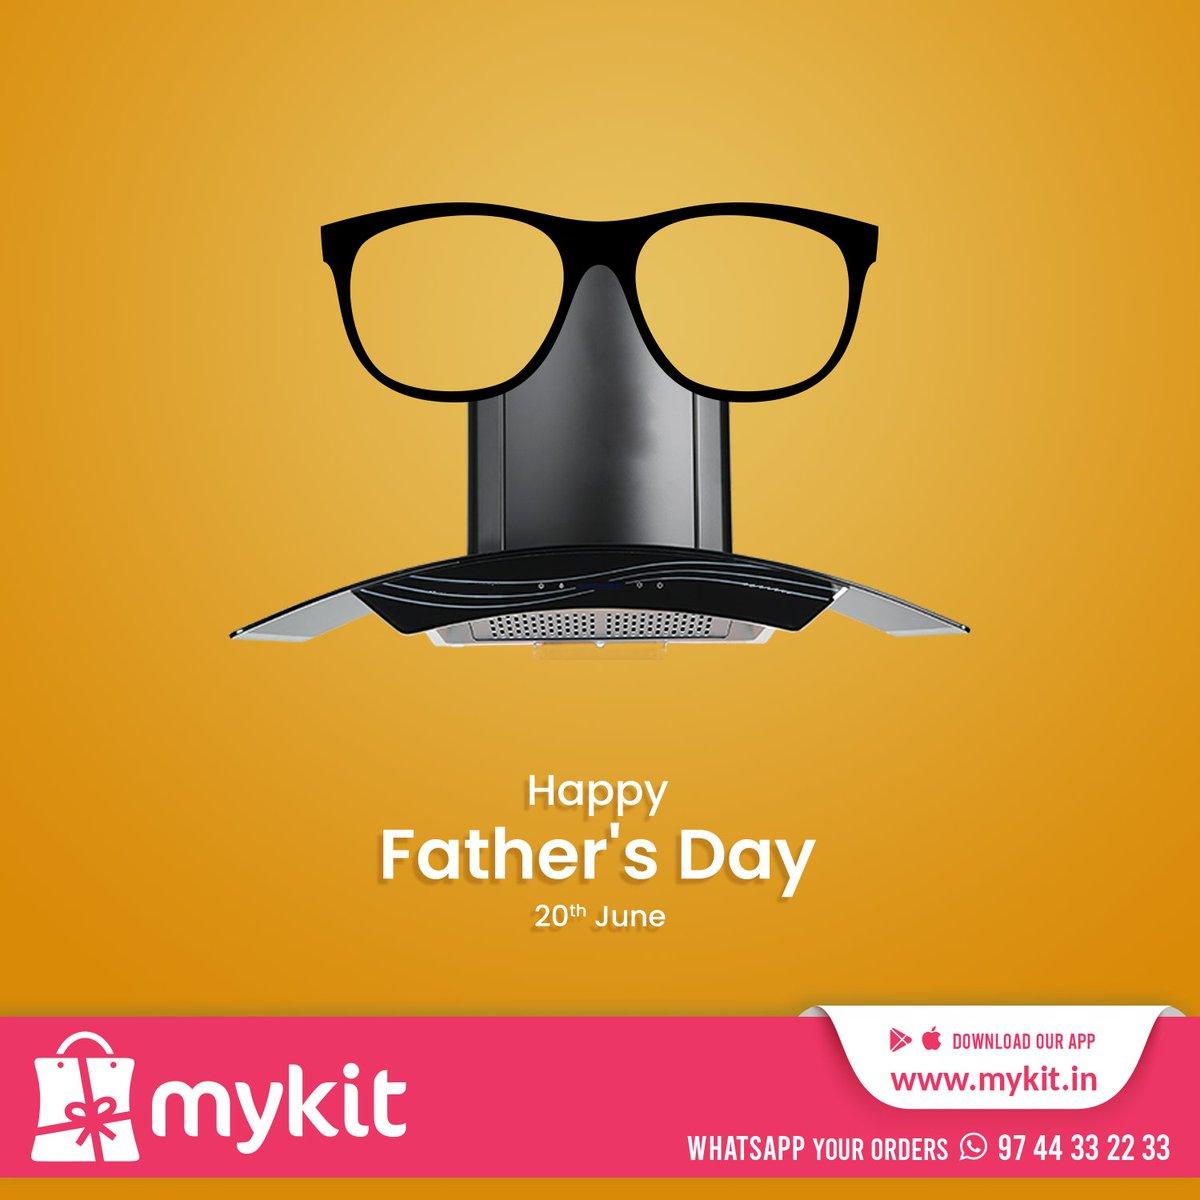 Happy Father's Day  #mykit #mykitcart #happyfathersday  #fathersday #onlineshopping #kannur #kerala https://t.co/gSKVjSMuRr